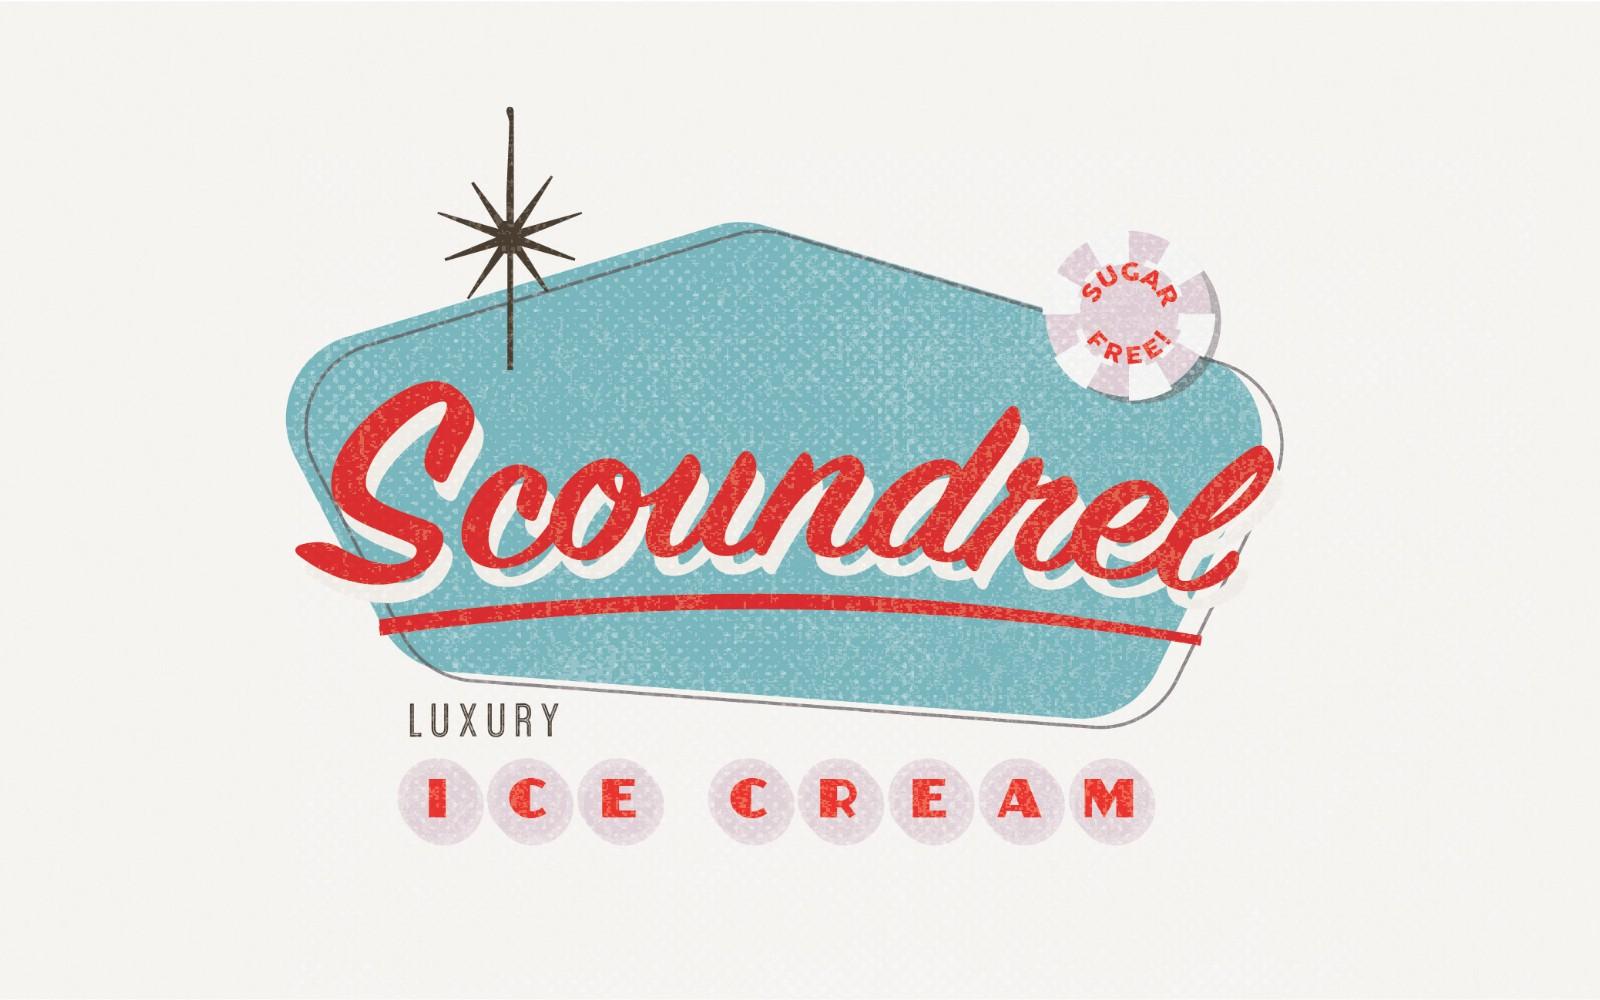 Our new sugar free ice cream!